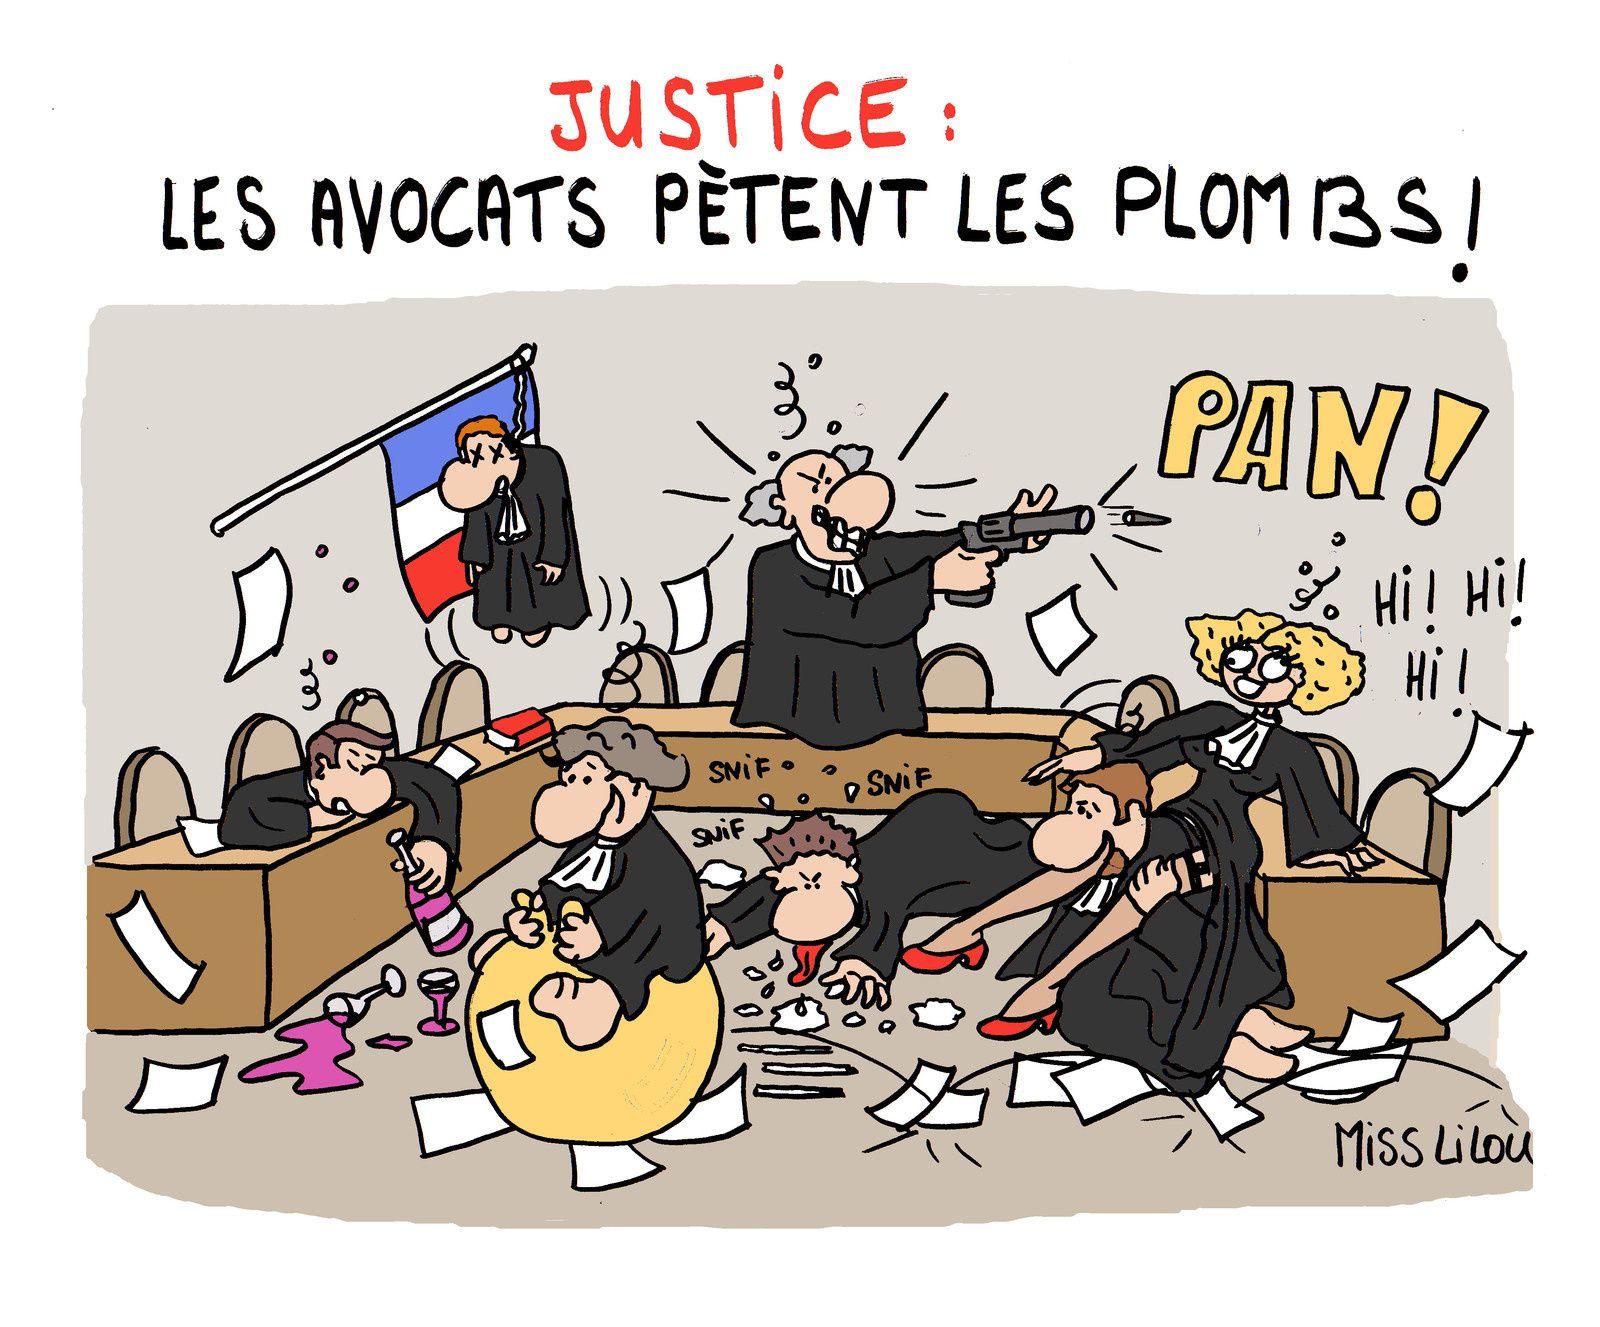 JUSTICE : les Avocats pètent les plombs !